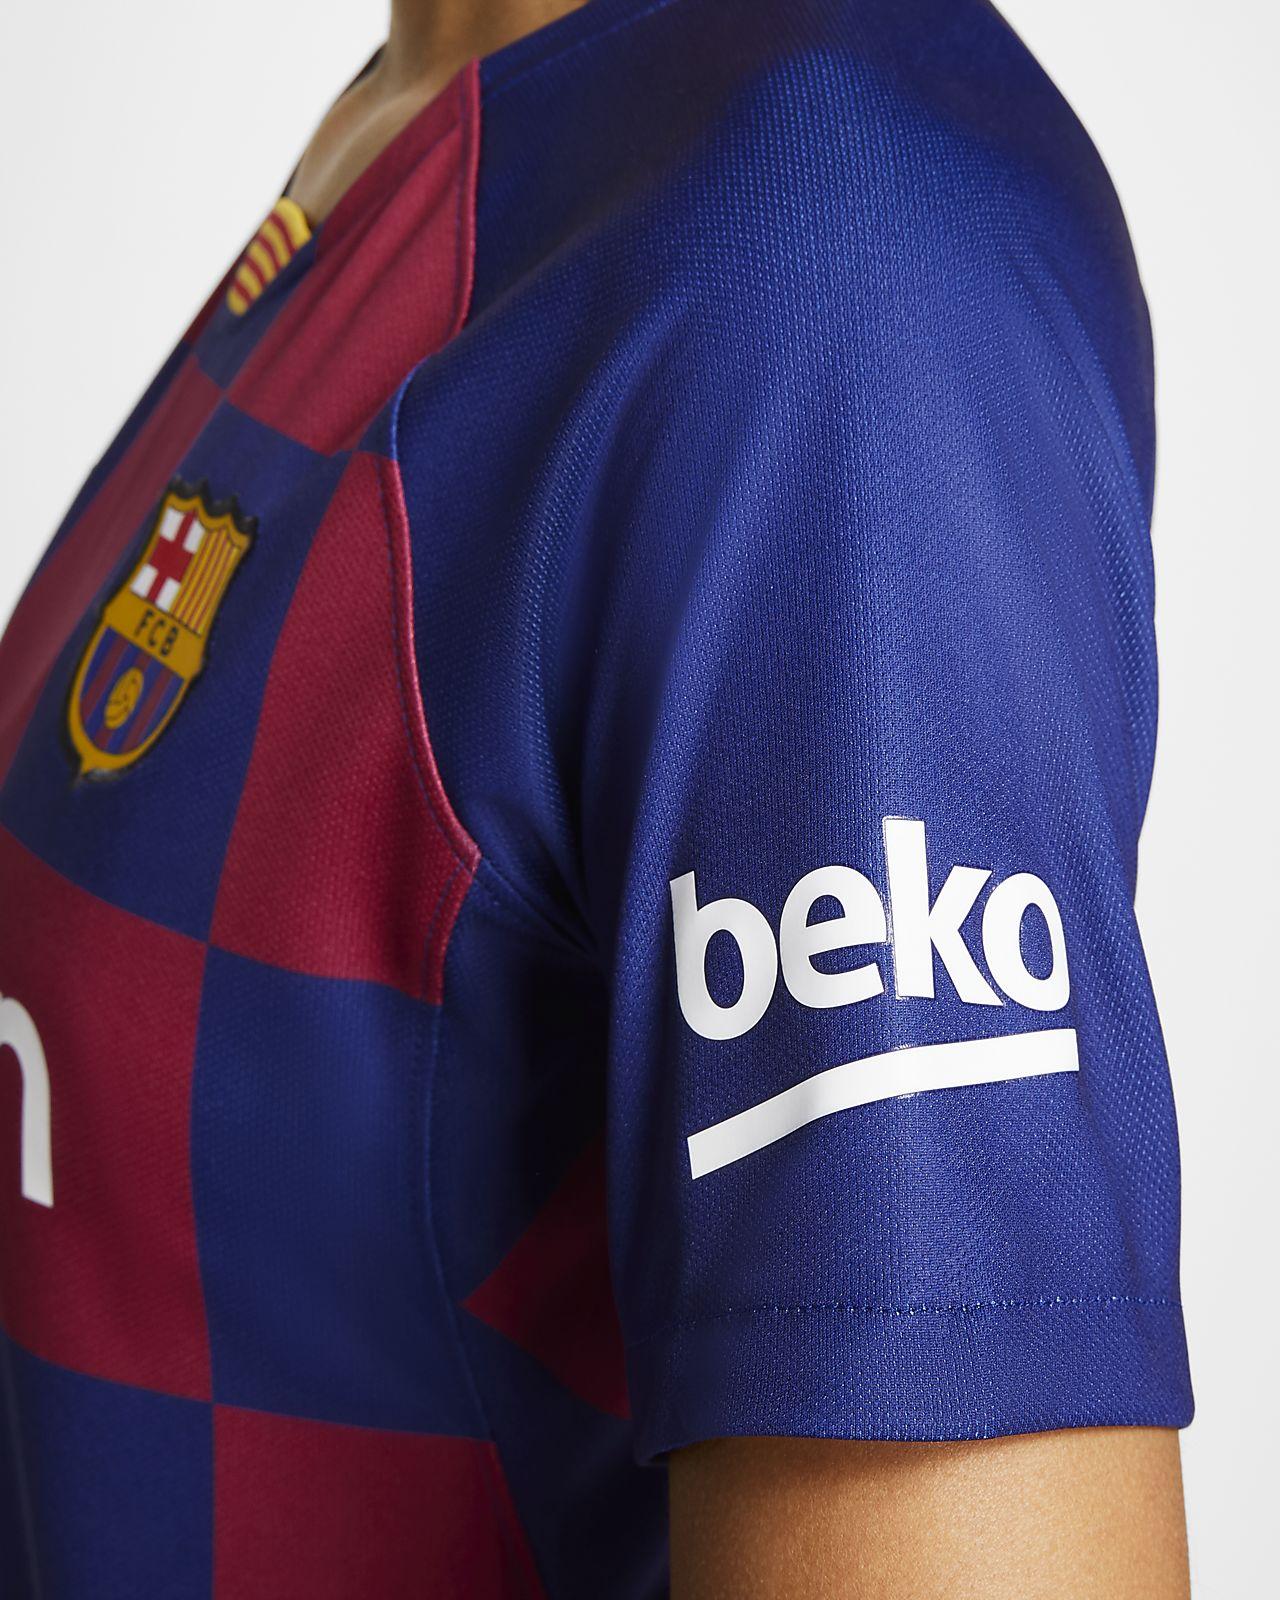 new arrivals df513 5fcdc FC Barcelona 2019/20 Stadium Home Women's Soccer Jersey